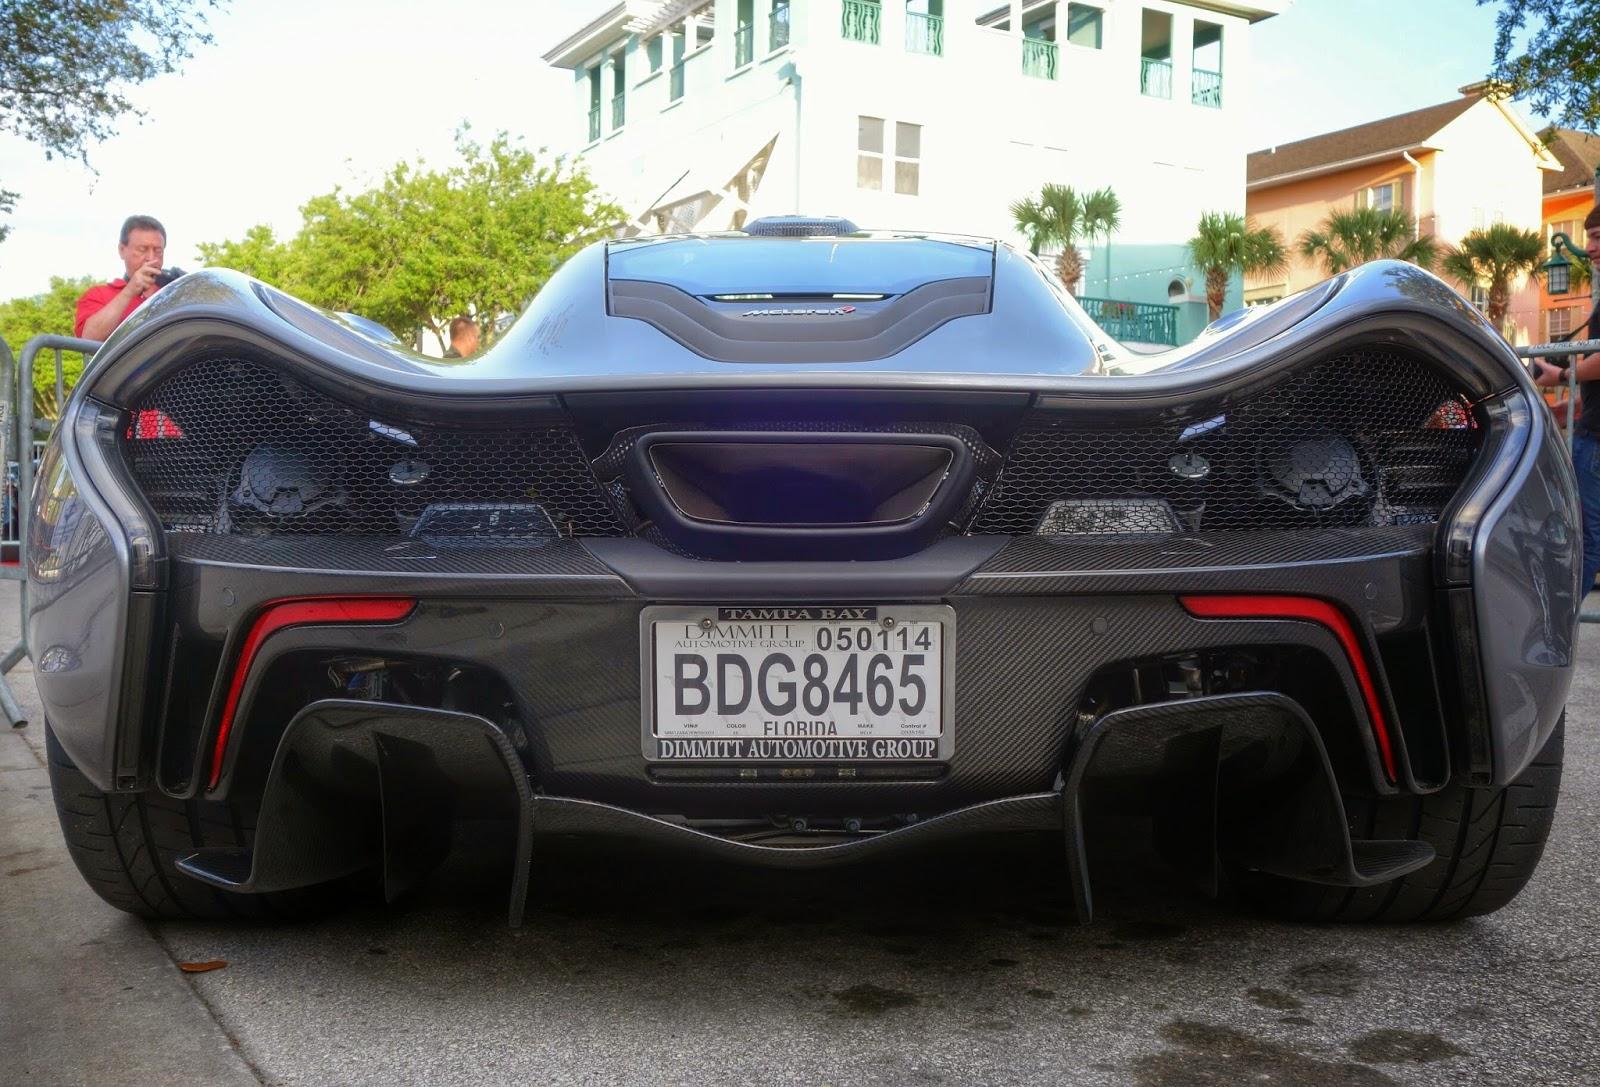 The Sexy Mclaren Hot Supercars